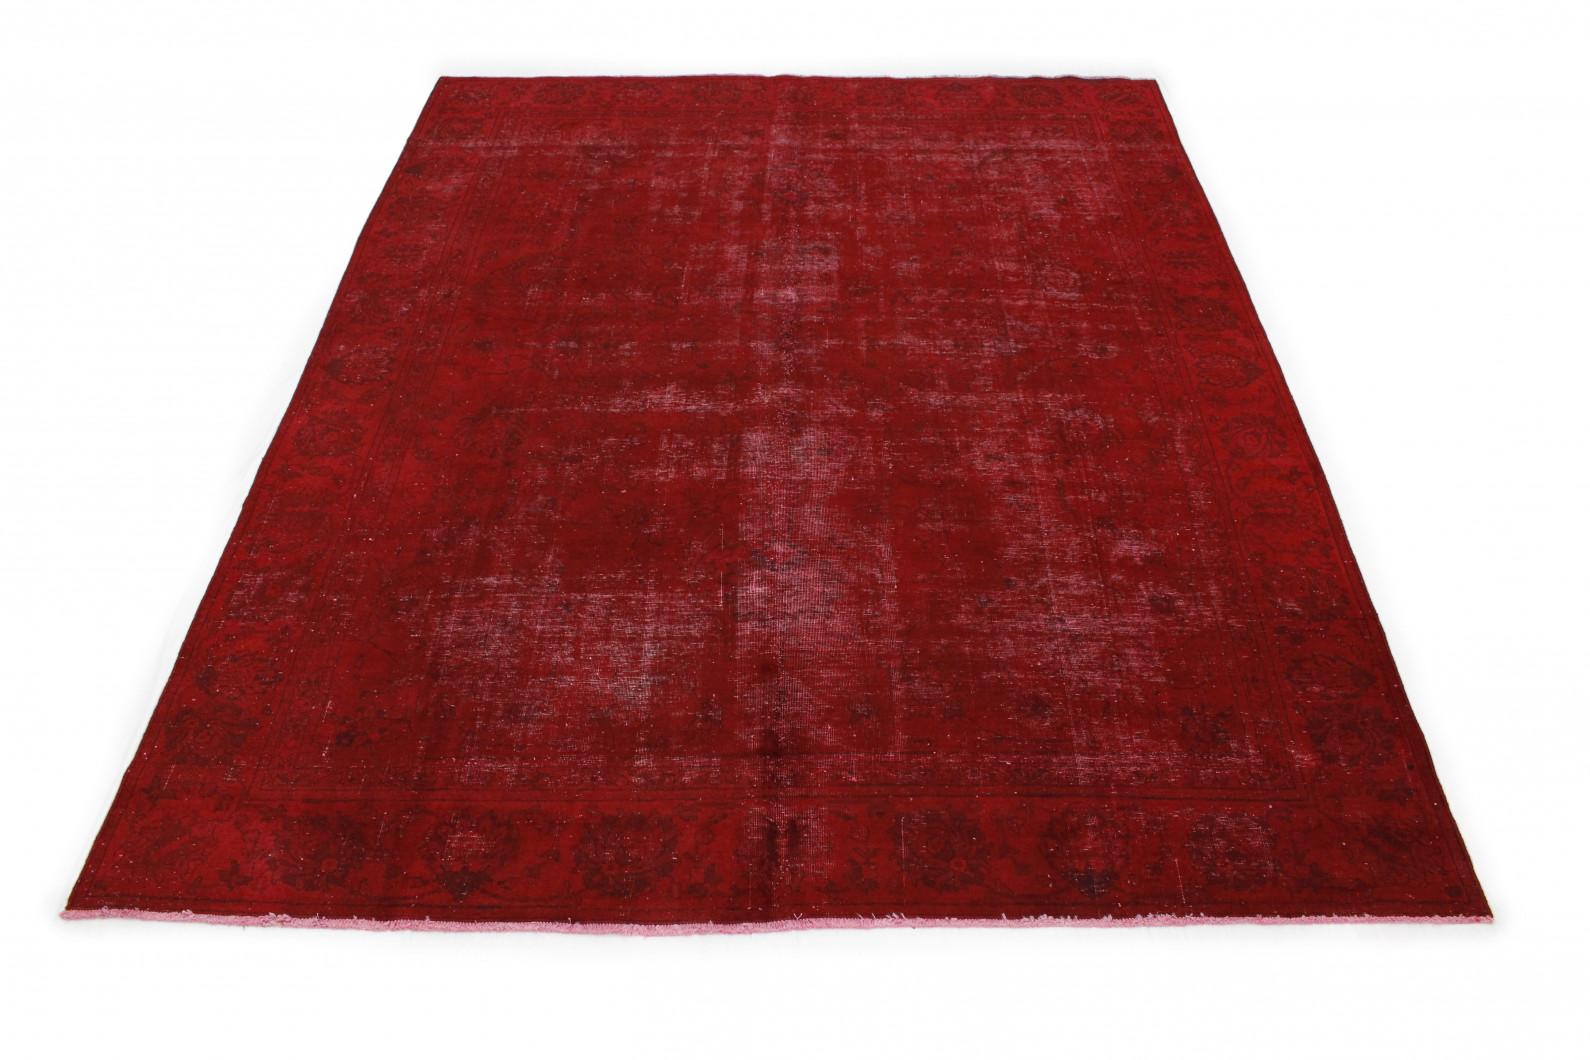 Vintage Teppich Rot in 380x290cm